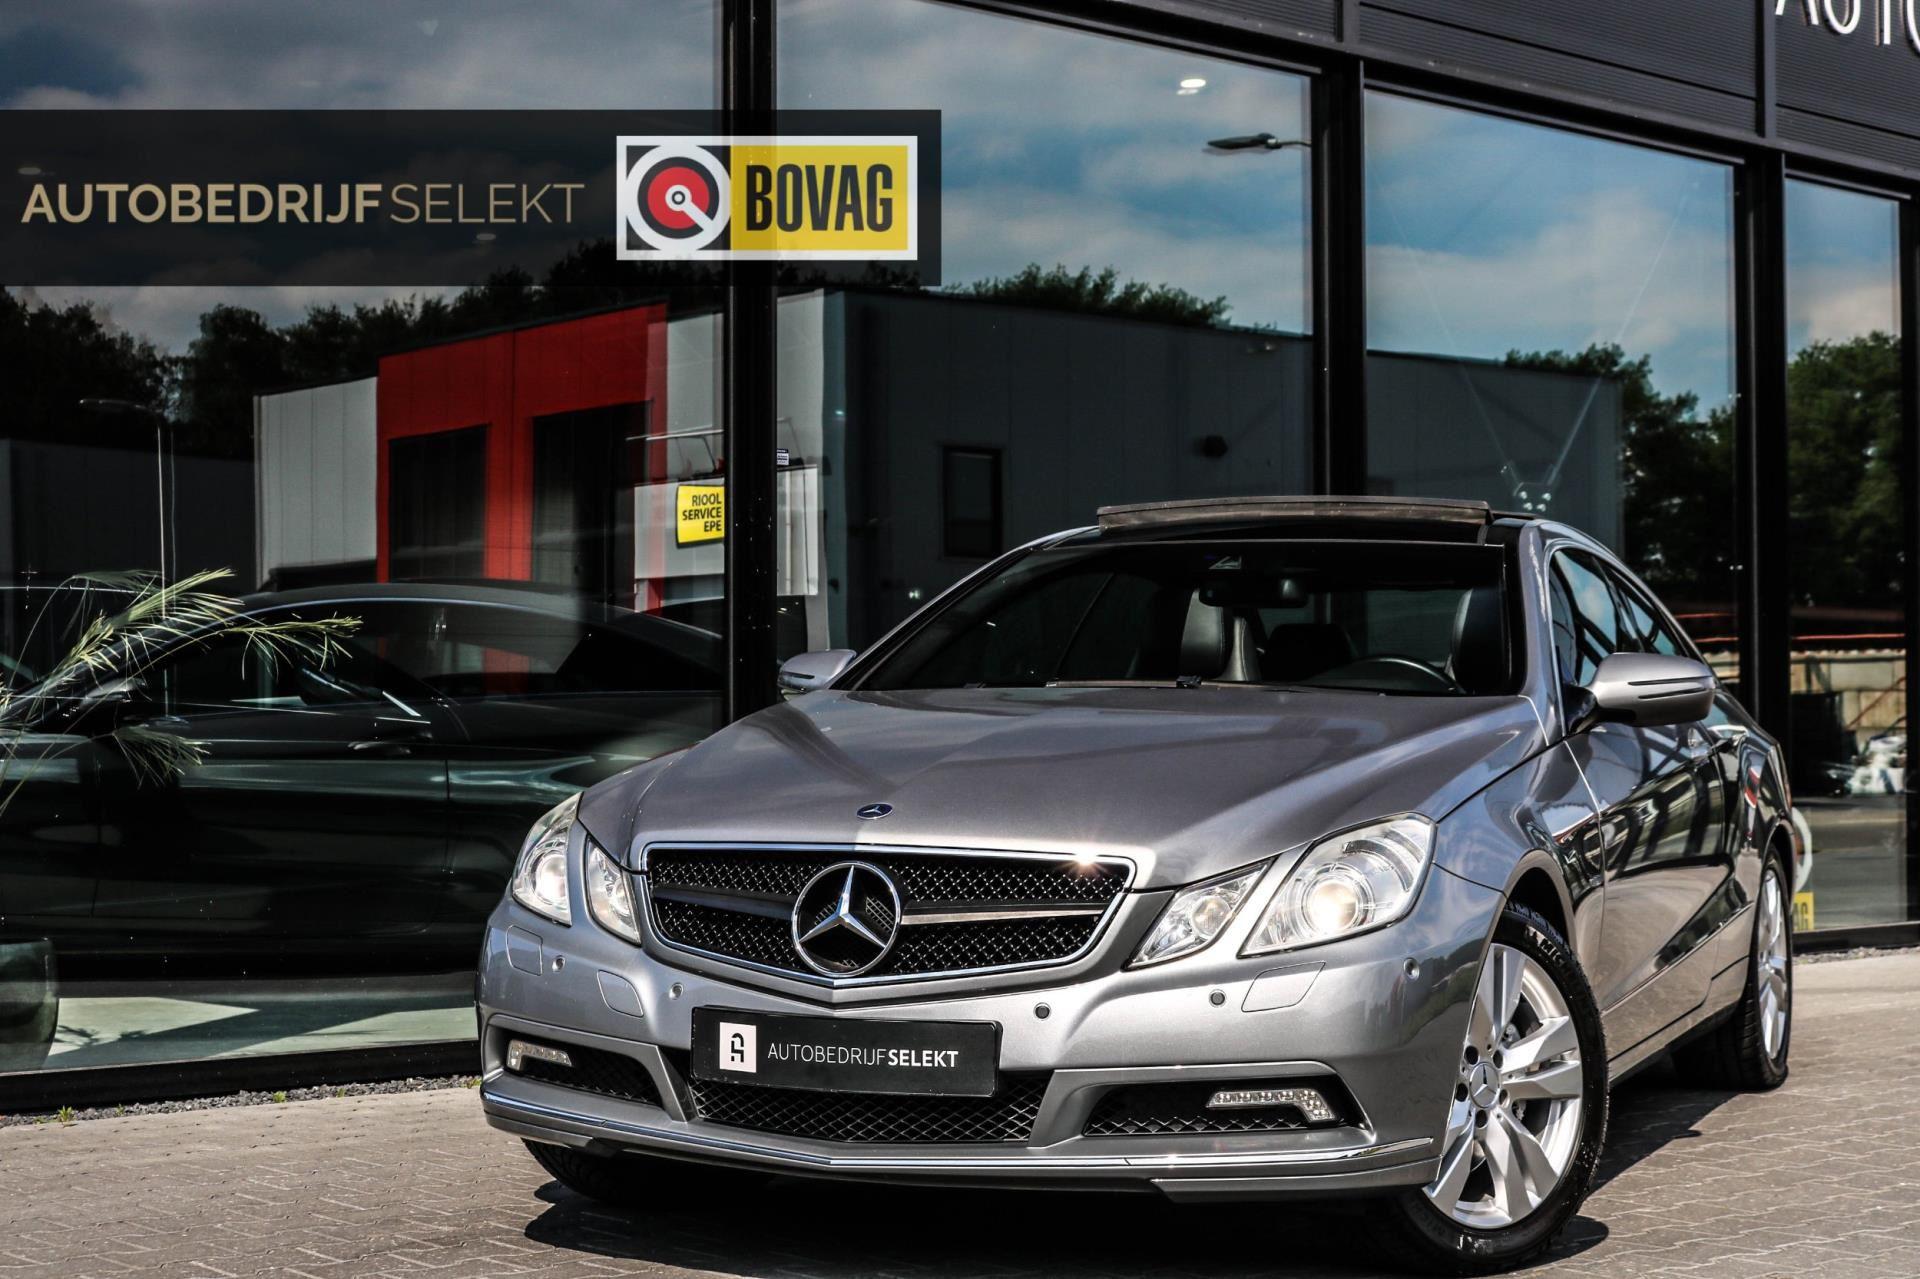 Mercedes-Benz E-klasse occasion - Autobedrijf Selekt B.V.